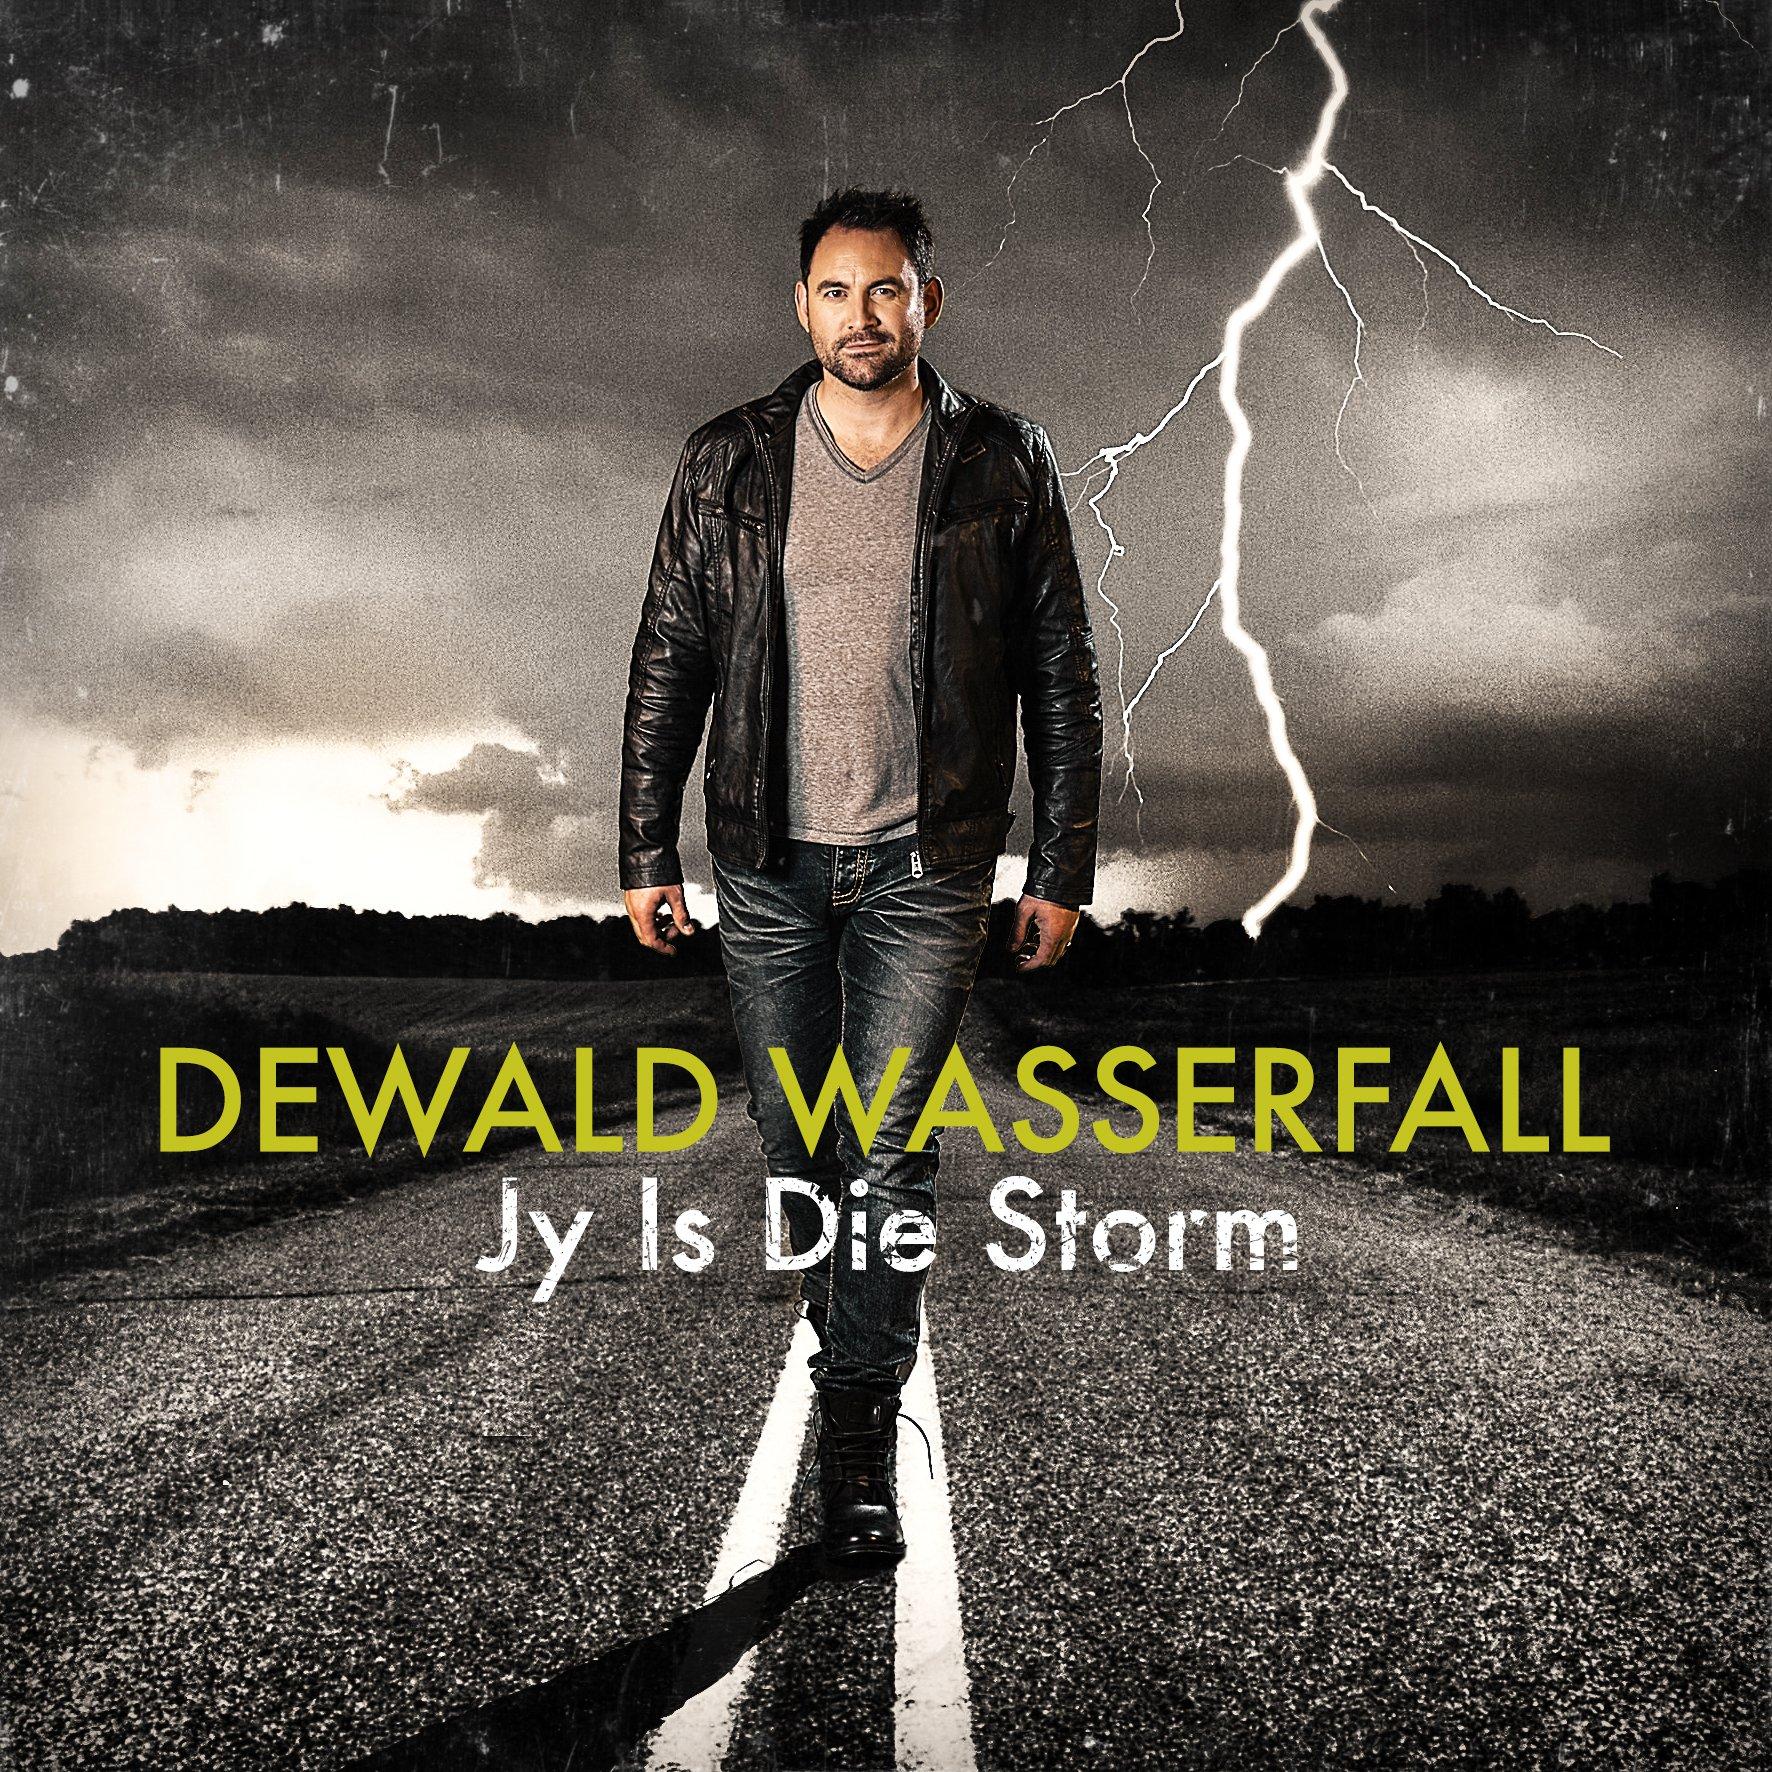 Dewald wasserfall jy is die storm